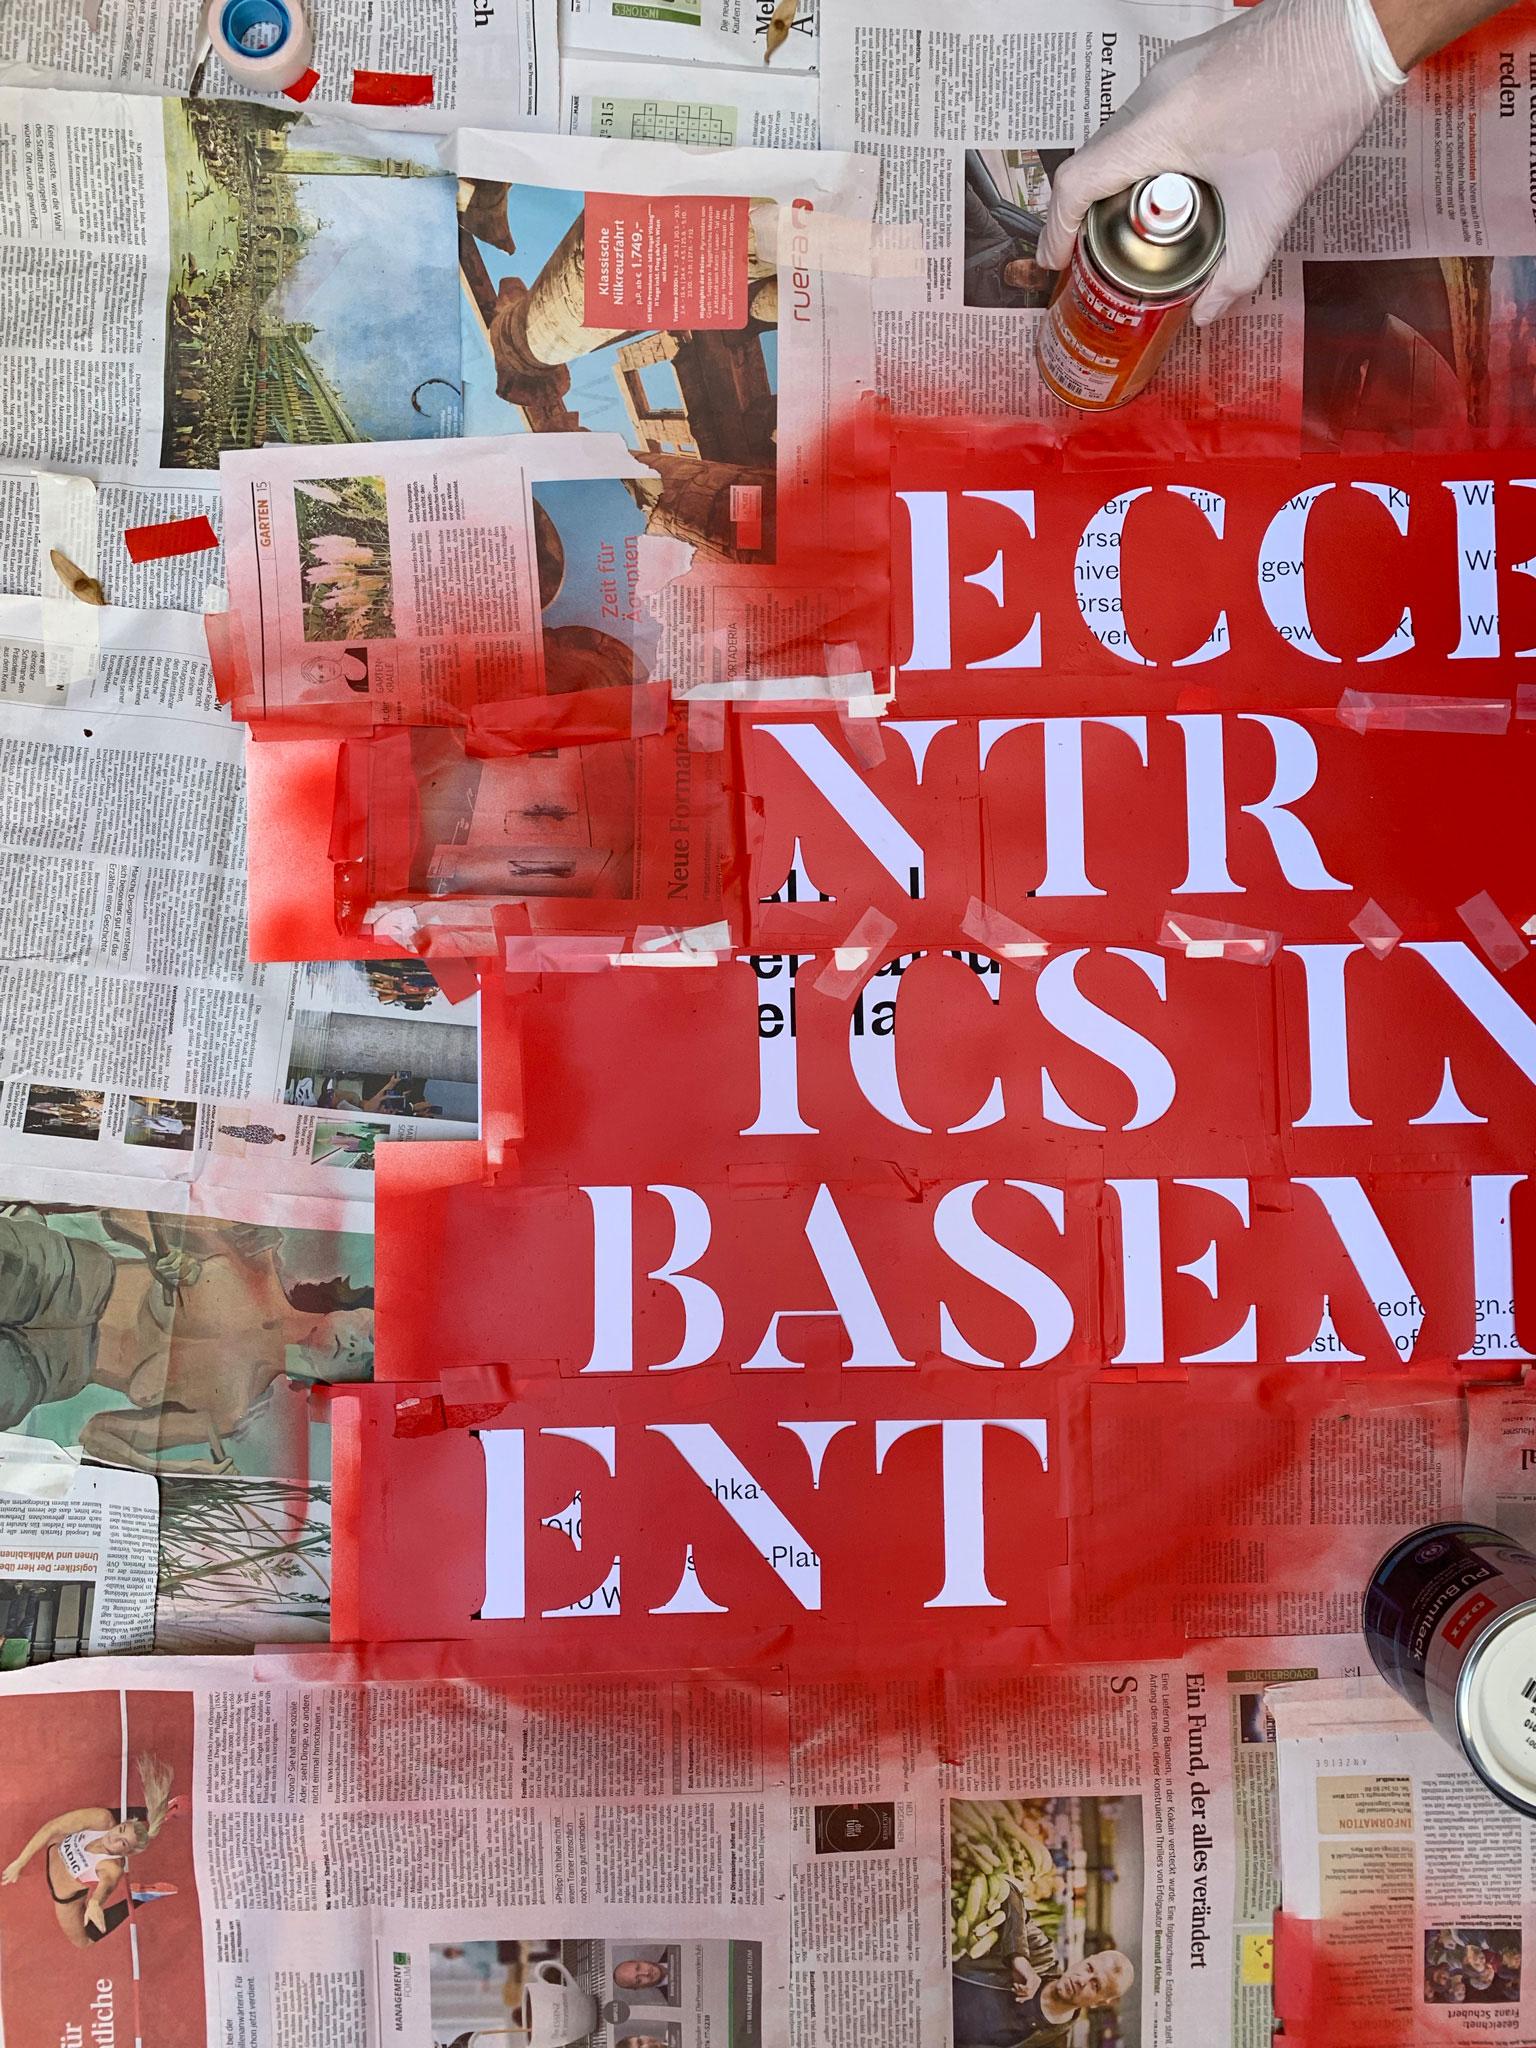 Eccentrics in Basement — Making of